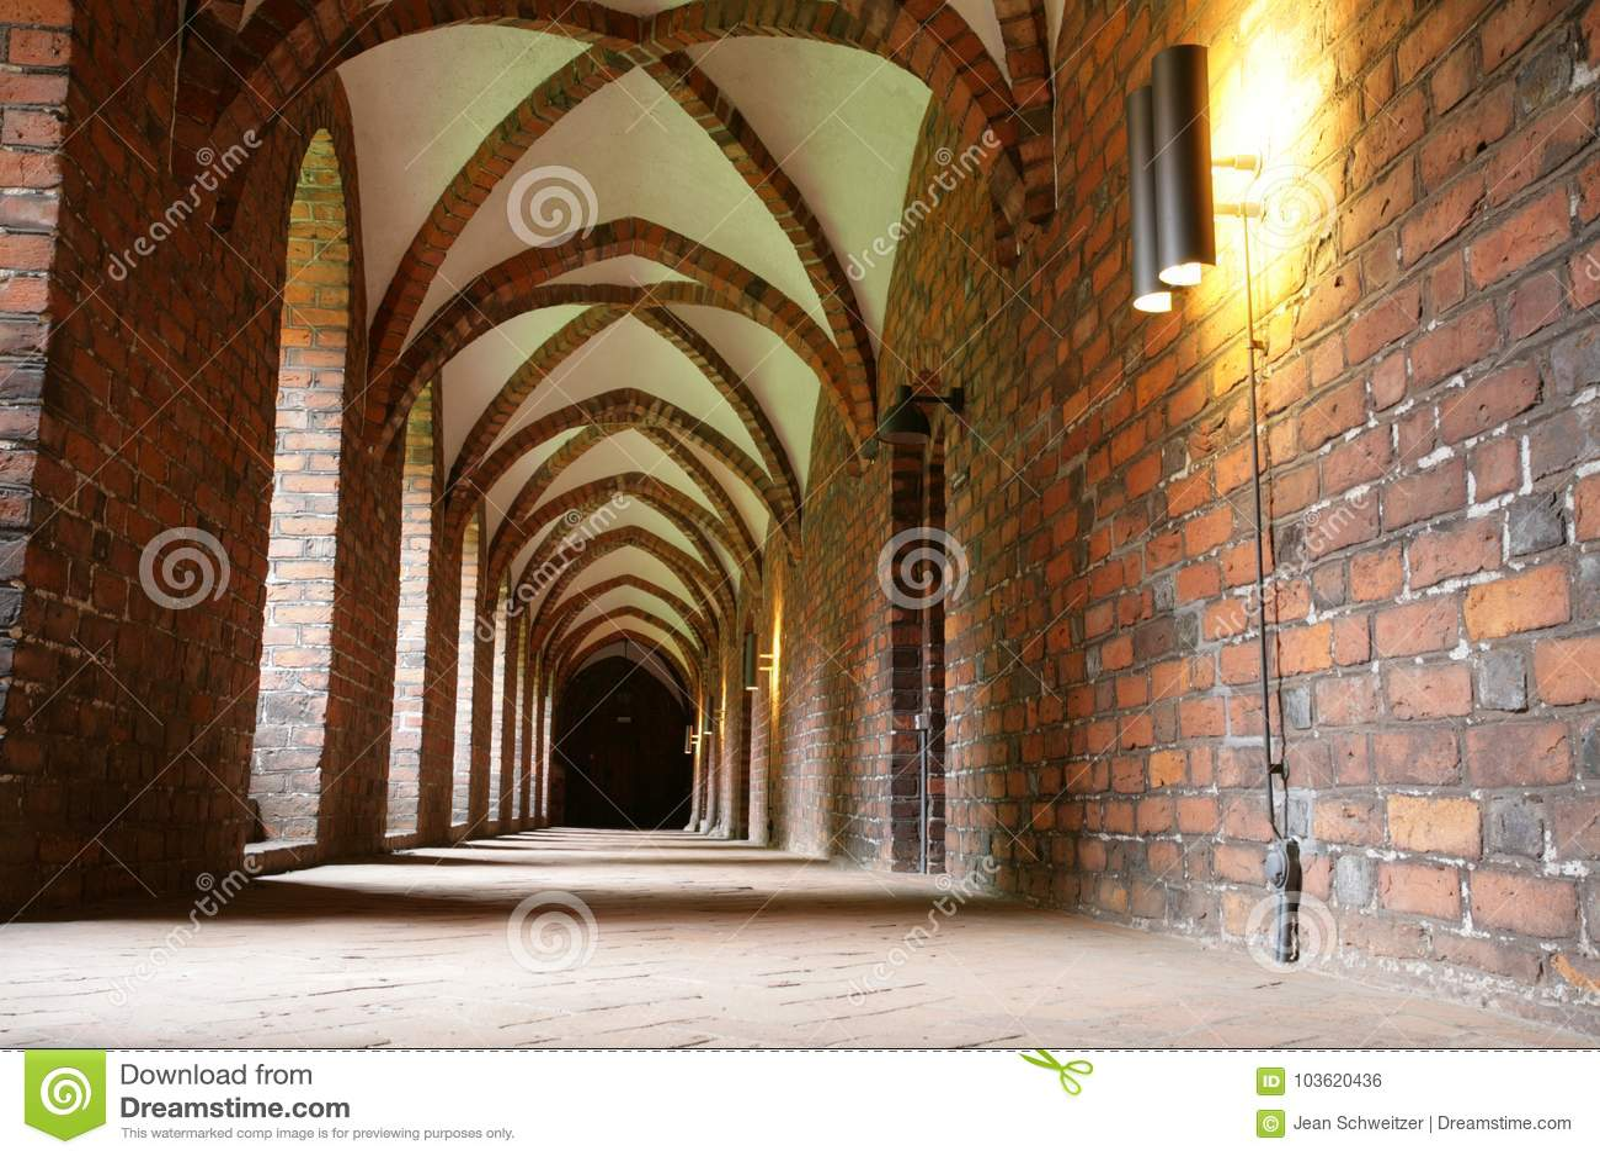 Vor Frue修道院,一个卡默利特平纹薄呢修道院在Elsinore Helsing